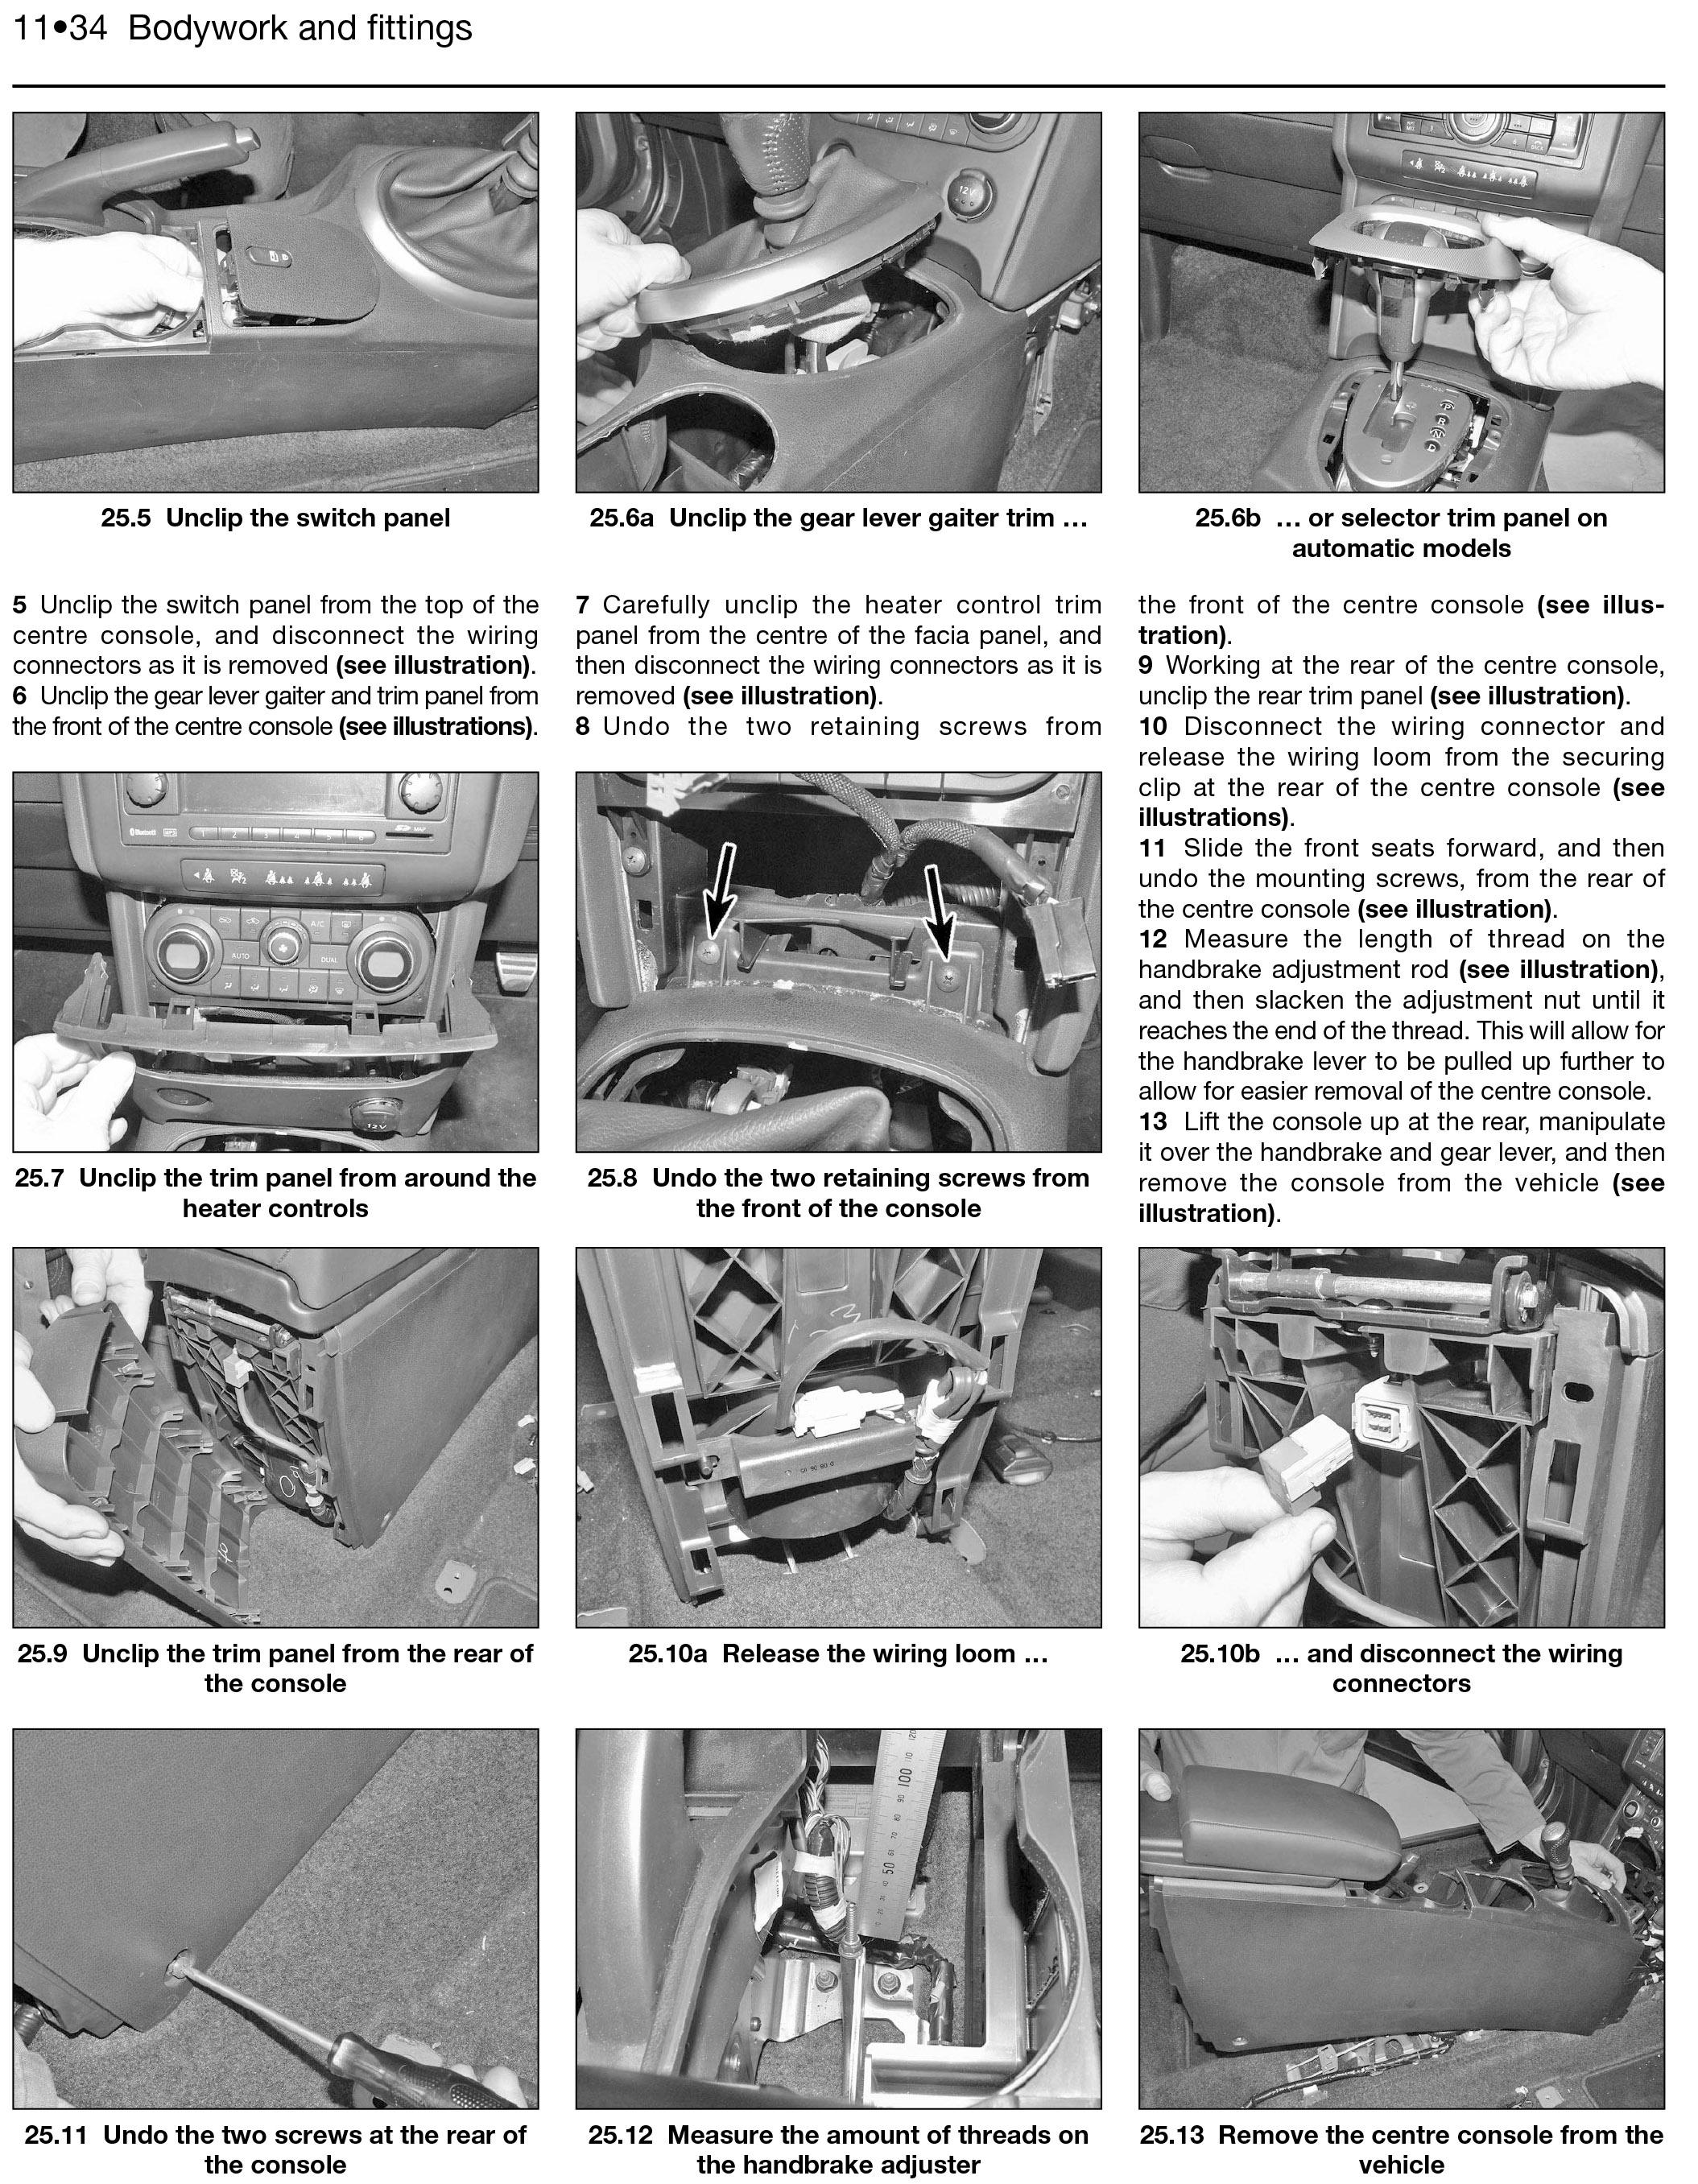 Wiring diagram nissan qashqai uk wiring diagram nissan qashqai petrol diesel 07 13 haynes repair manual nissan qashqai cc wiring diagram nissan qashqai uk swarovskicordoba Image collections